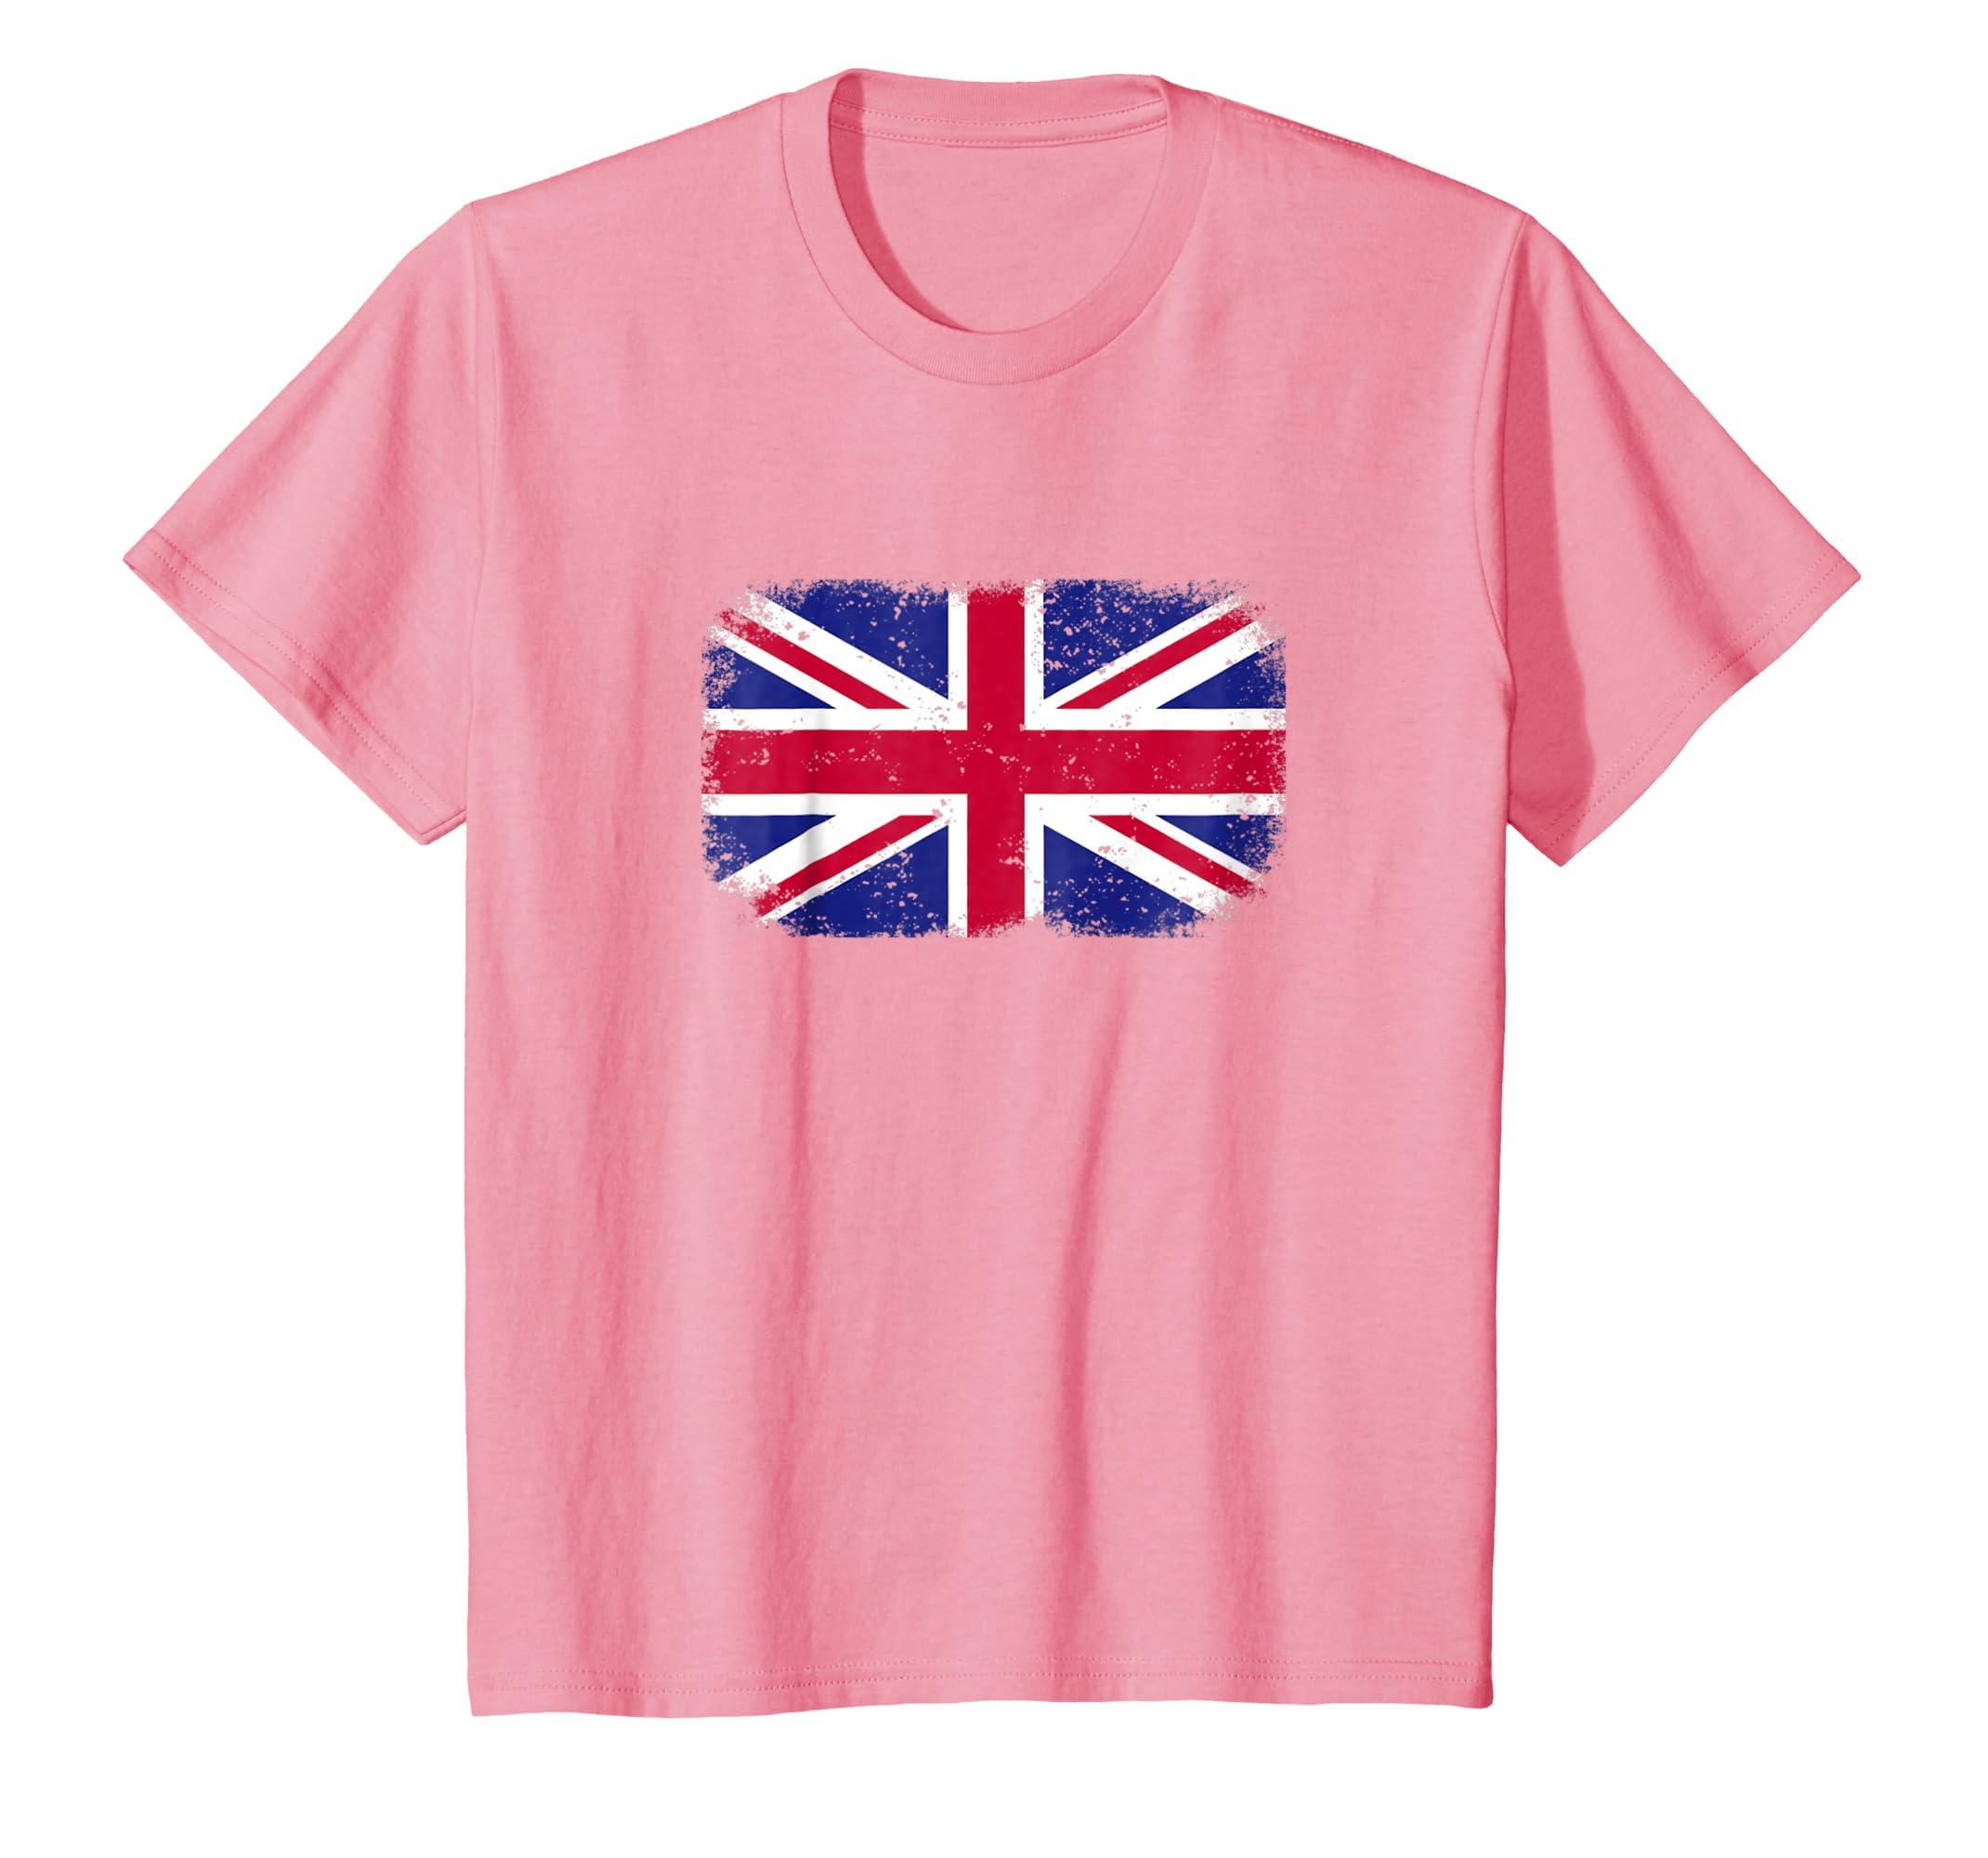 c43243970 Amazon.com: British England T-shirt Flag Distressed Graphic Expat London:  Clothing